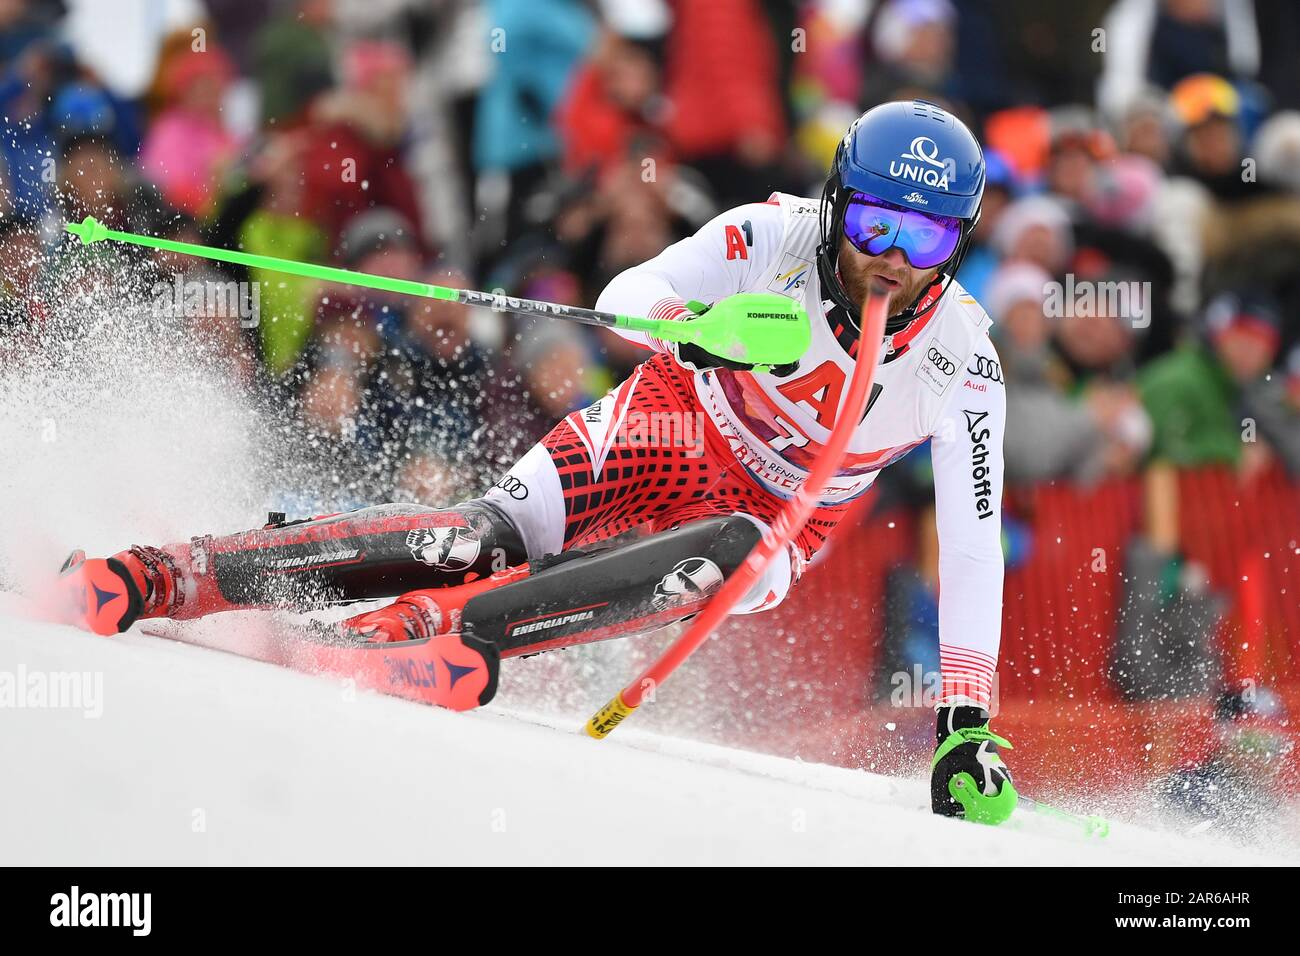 Marco SCHWARZ (AUT), action, alpine skiing, men's slalom, 80th Hahnenkamm race 2020, Kitzbuehel, Hahnenkamm, on January 26th, 2020 | usage worldwide Stock Photo